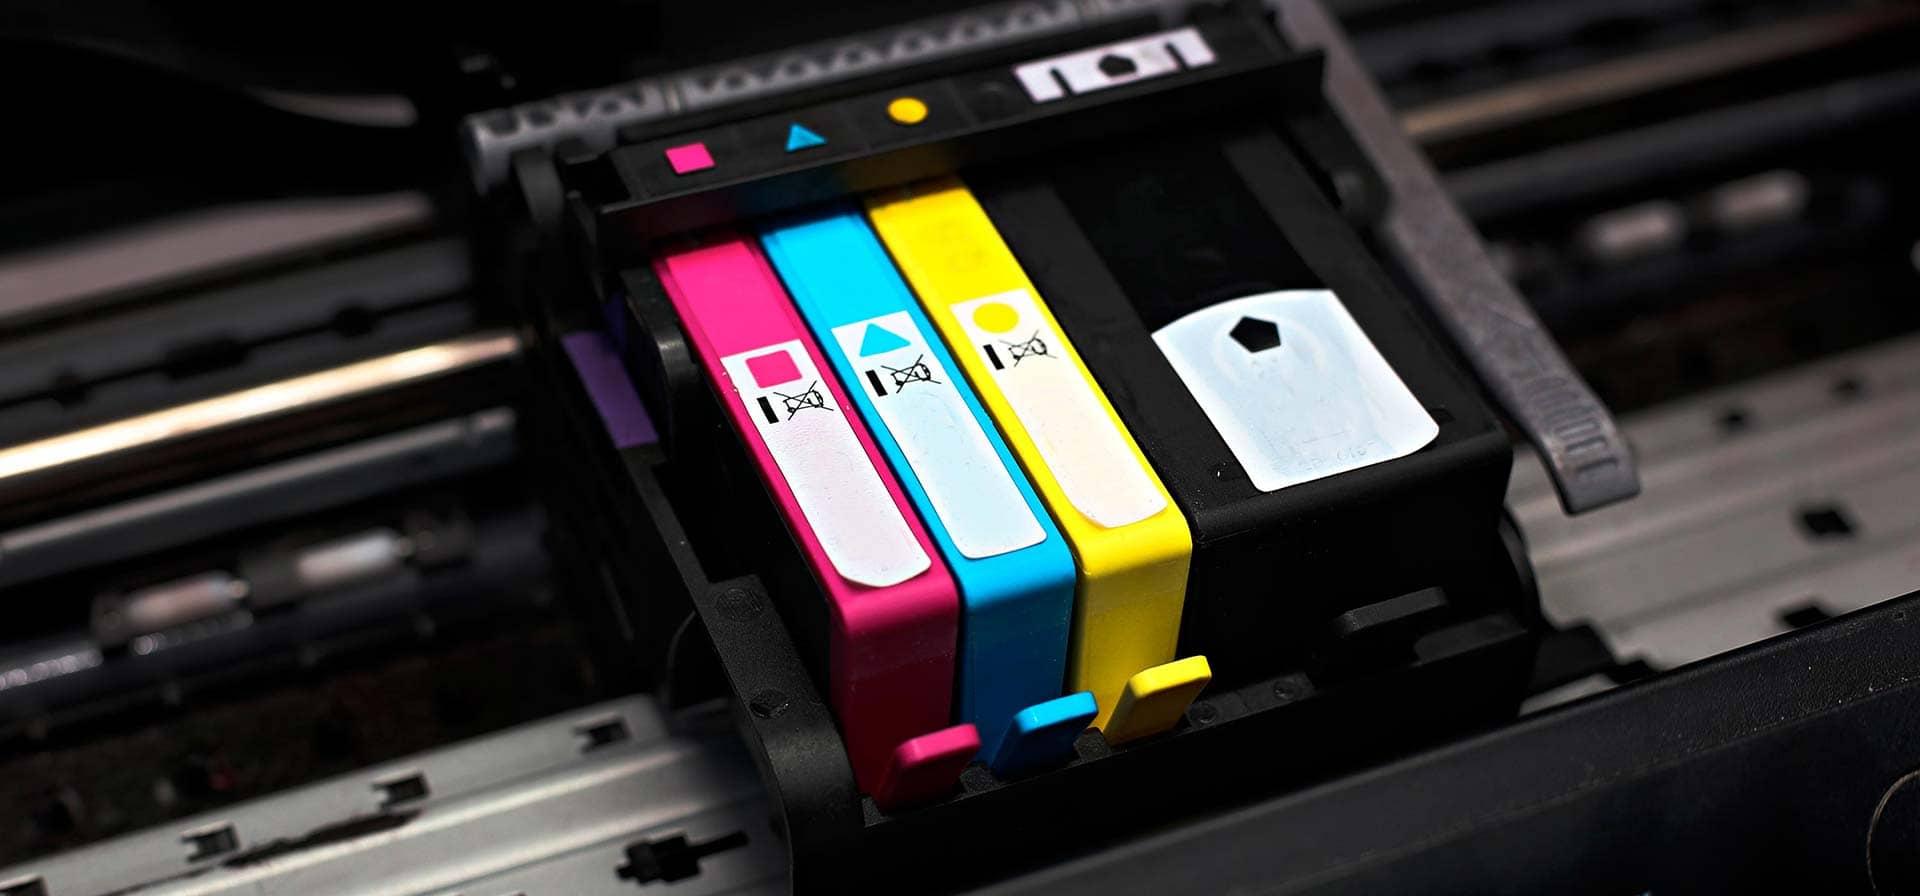 Cartuchos coloridos para impressoras